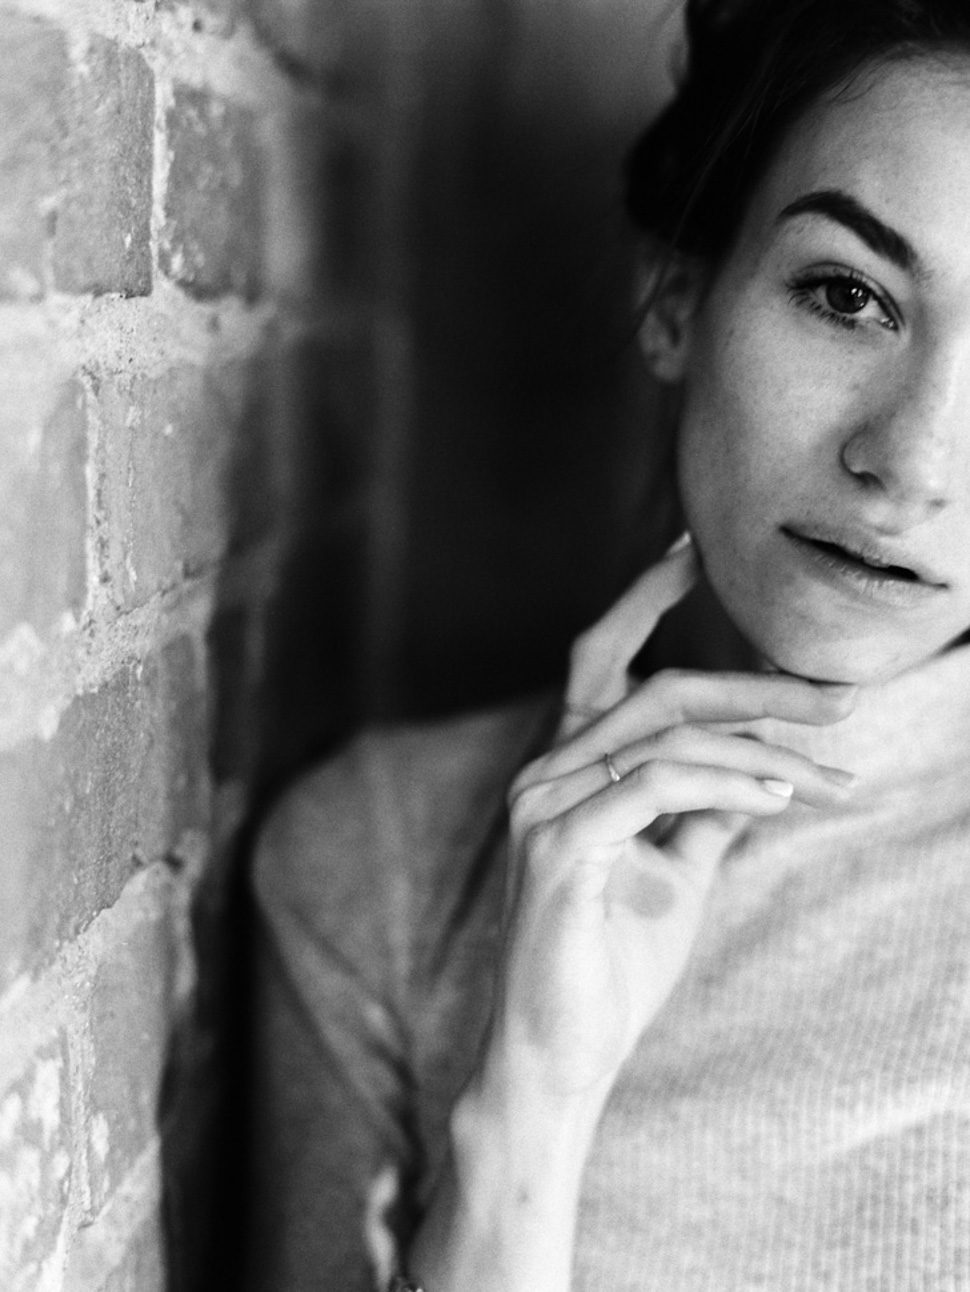 Photography workshop sensual portraits-6.jpg